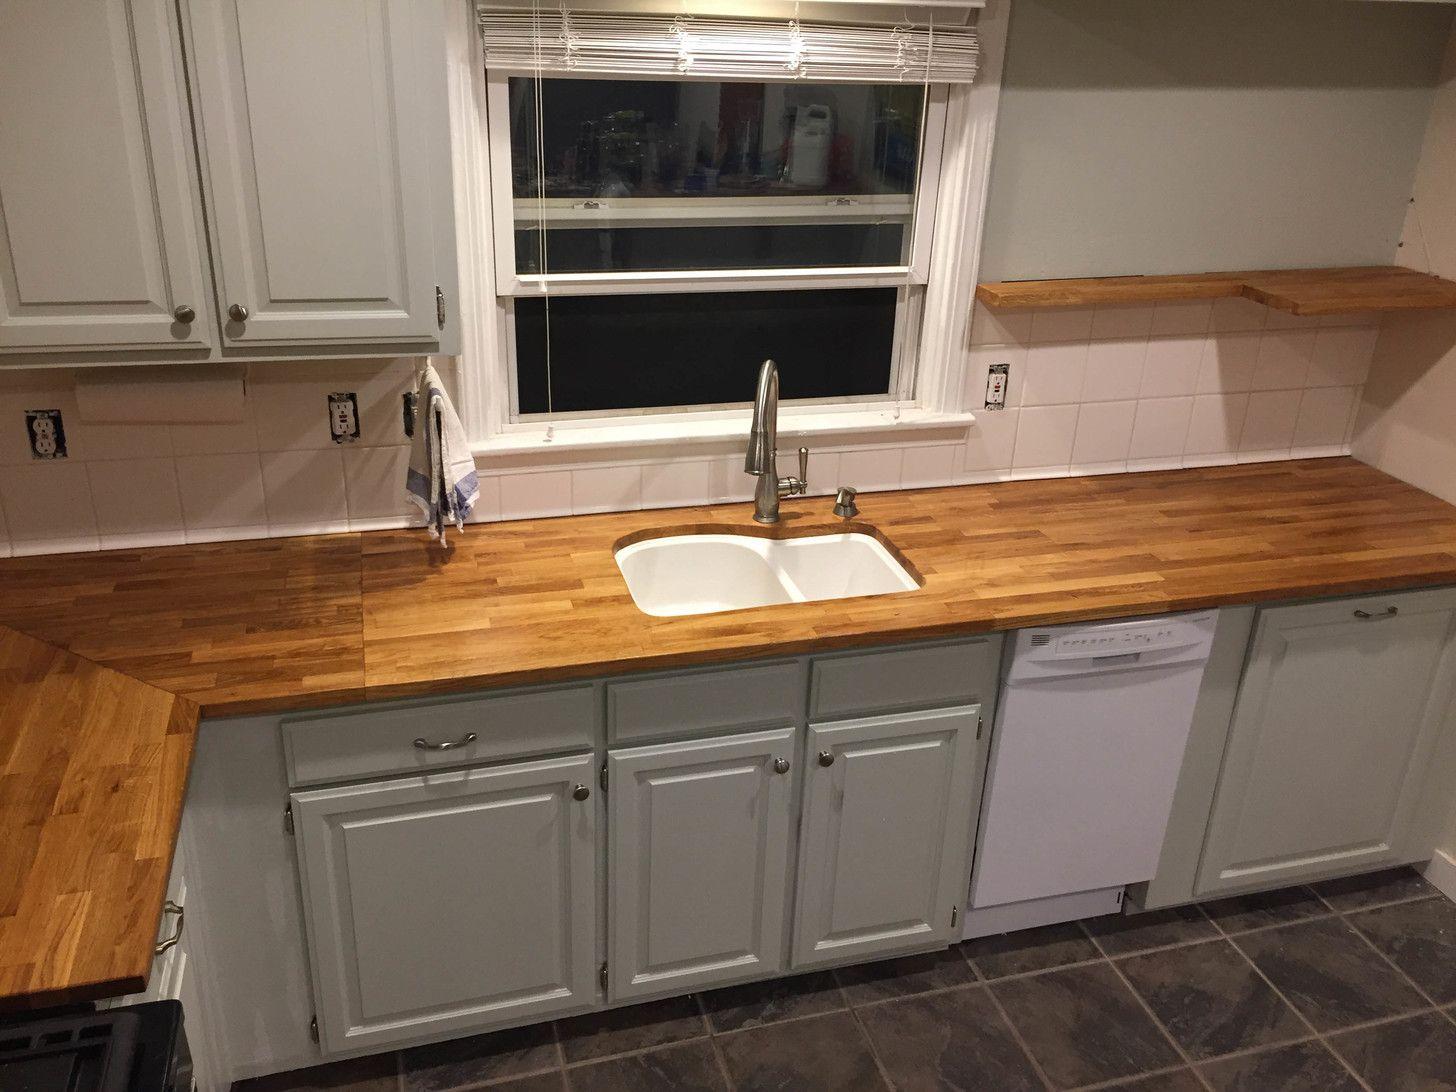 Ikea Countertops Hammarp Oak Kitchen Upgrades Diy Kitchen